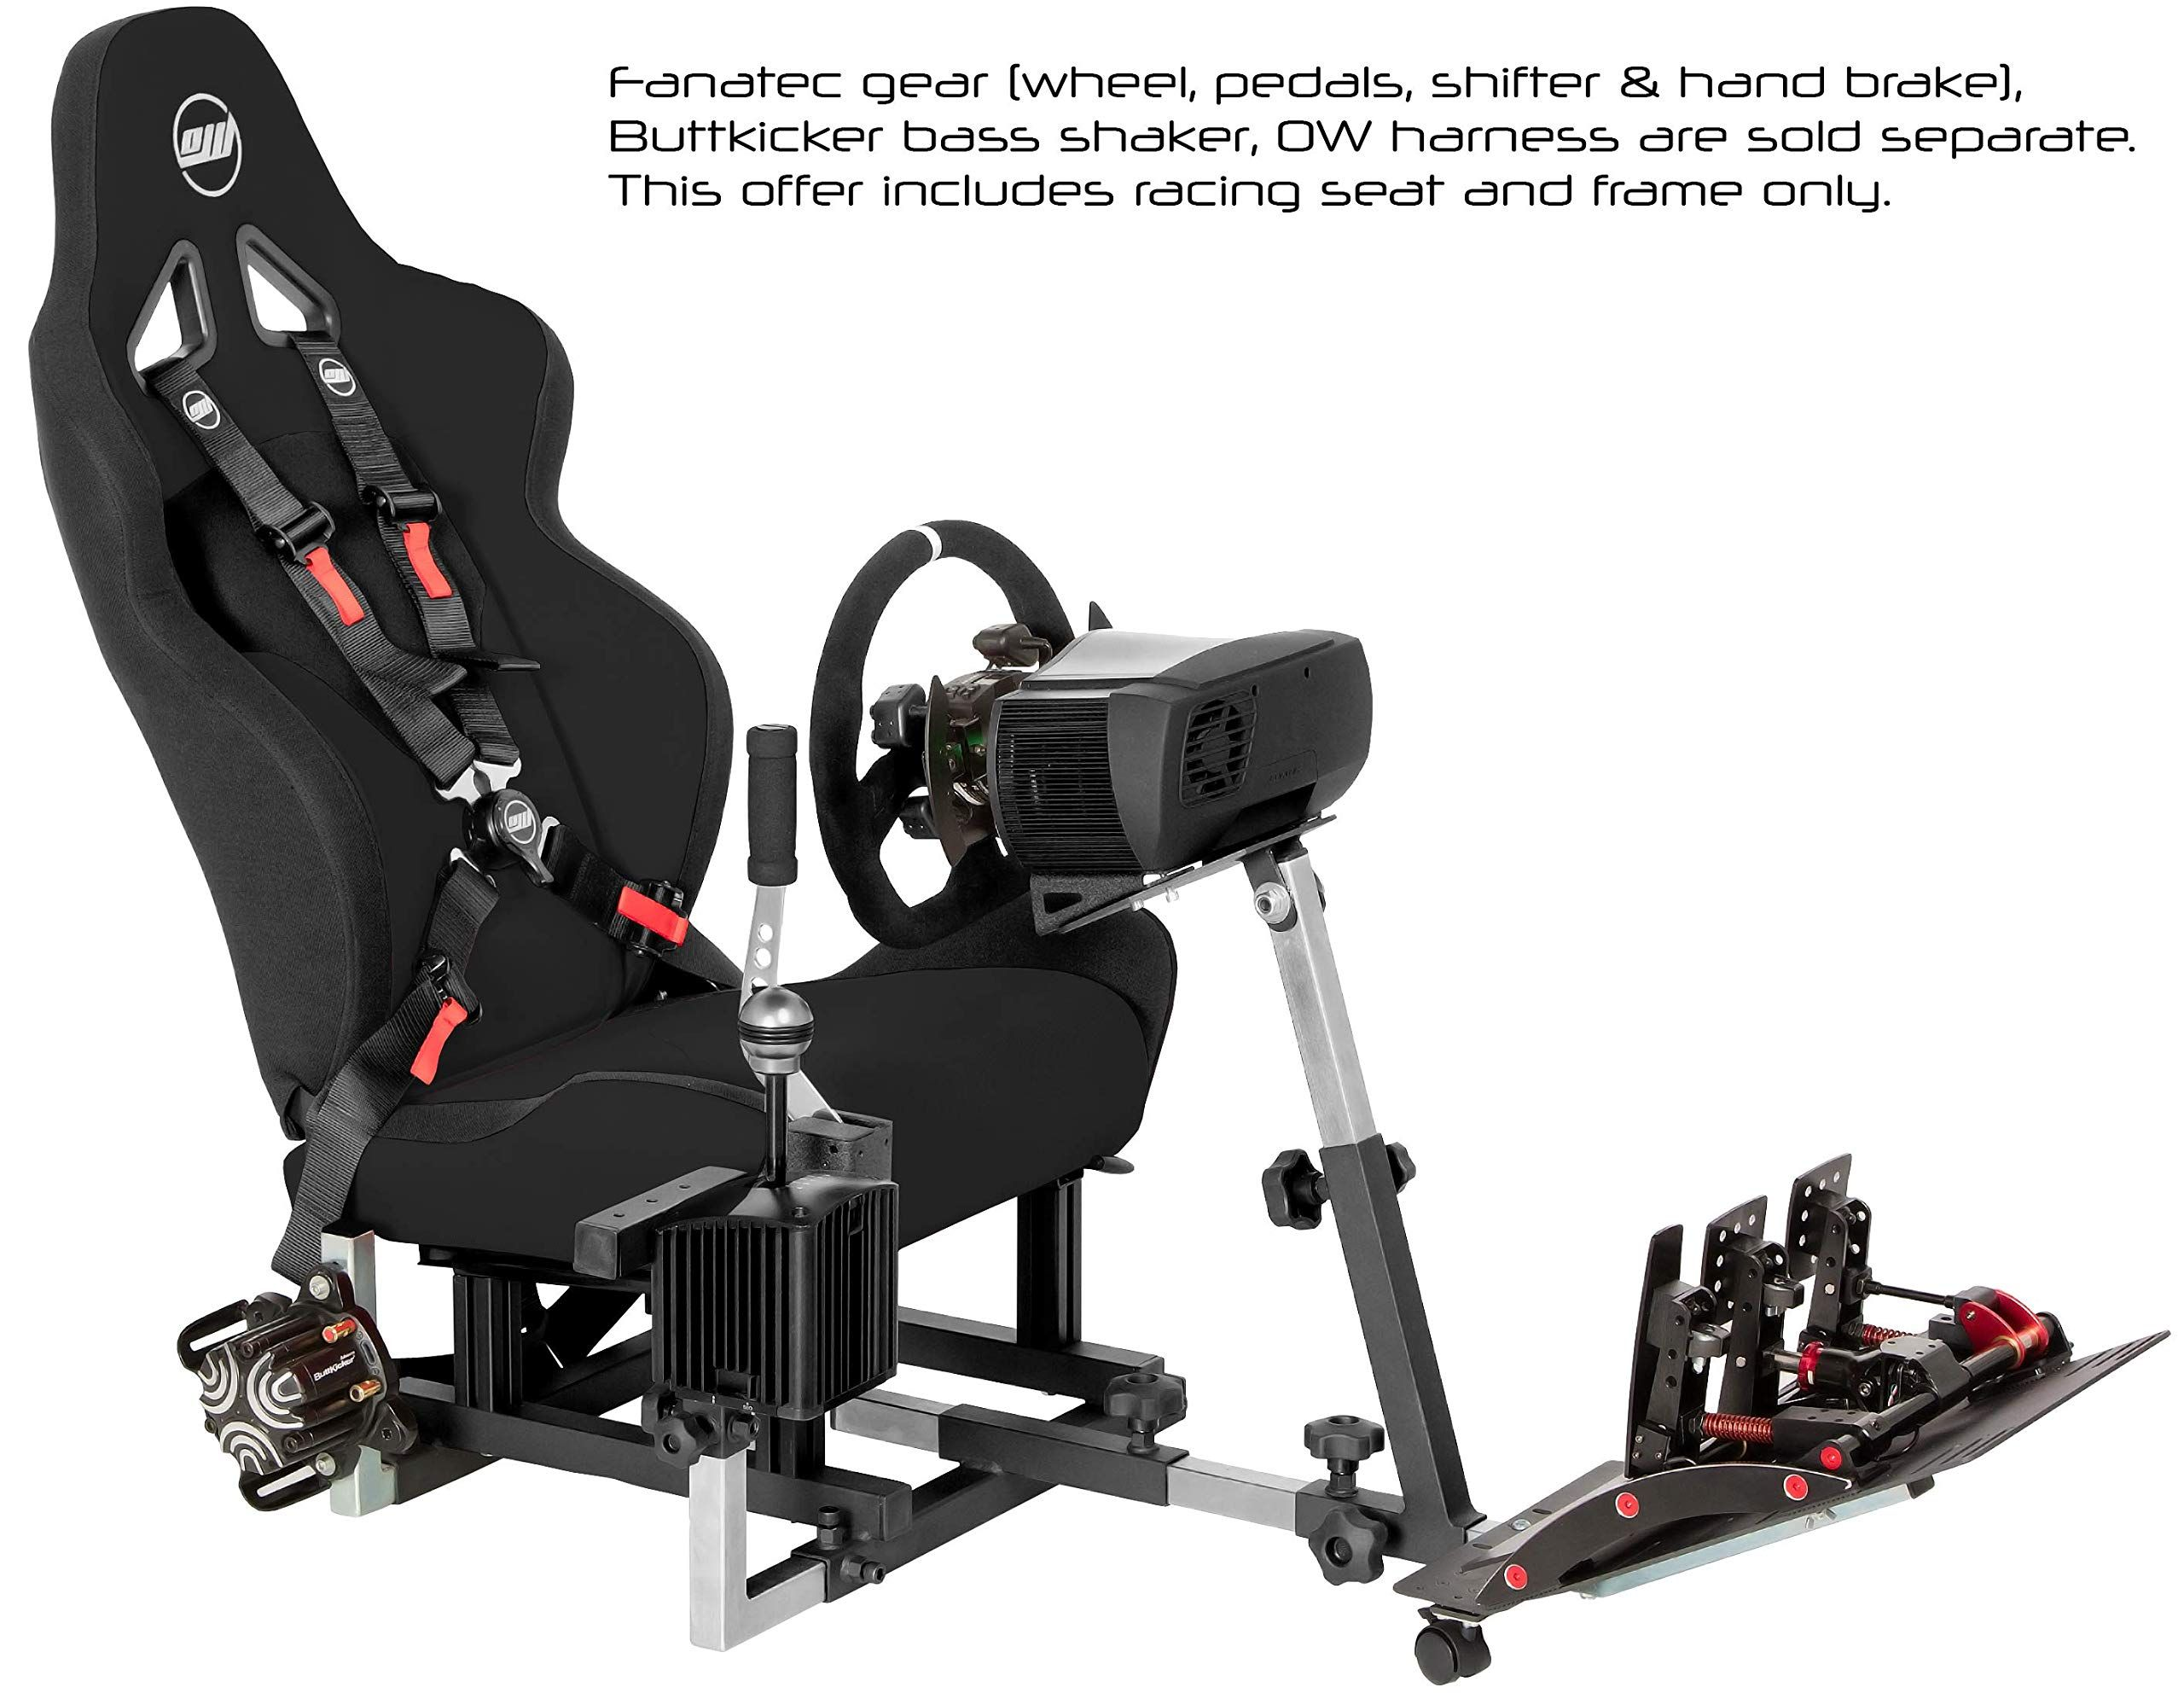 2e7057c2607 Openwheeler GEN2 Racing Wheel Stand Cockpit Black on Black Fits All Logitech  G29 G920 All Thrustmaster All Fanatec Wheels,#Stand, #Cockpit, #Black,  #Wheel